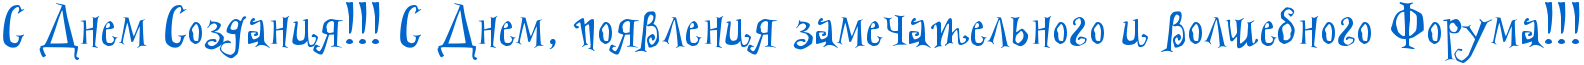 http://x-lines.ru/letters/i/cyrillicdreamy/0192/0066CC/40/0/4no1bwrw4n67bpqozoopbeqoz5emxwfw4napbxqozdea6ejbrropbejy4nkpbxqoszemamby4n97bxstt9emfwf54n47bxqozdea6egos9embwfh4n47db6osdeafwfi4n77ddgozzem7wfu4n9nbwfardemfwf64n77dngoszemdwf74n9pbc6ozaopbjgoz5eabwcd4n6pbcbbrroo.png